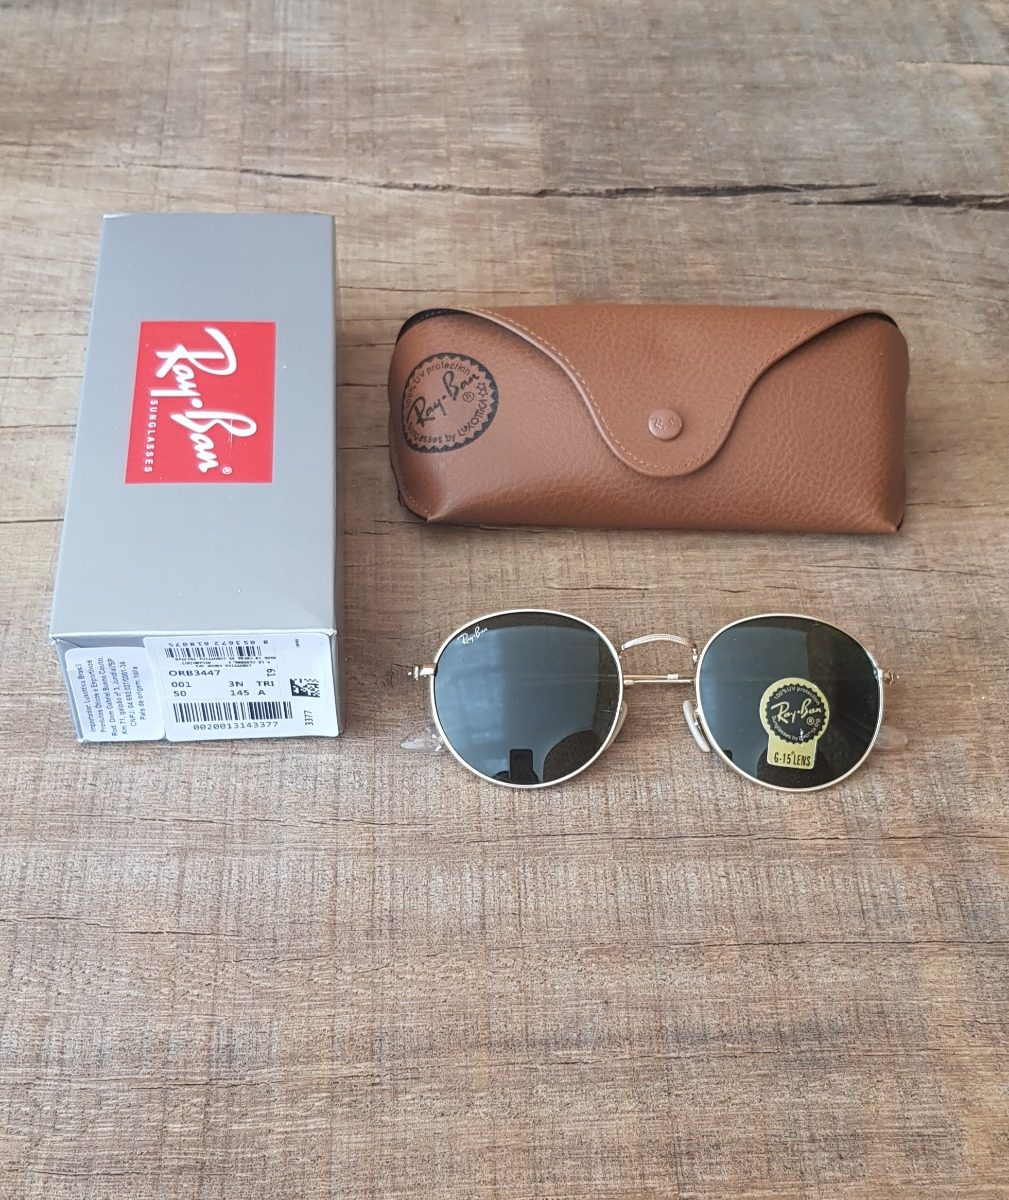 29929ac76b70f óculos ray ban clubmaster tartaruga g15 e round metal g15. Carregando zoom.